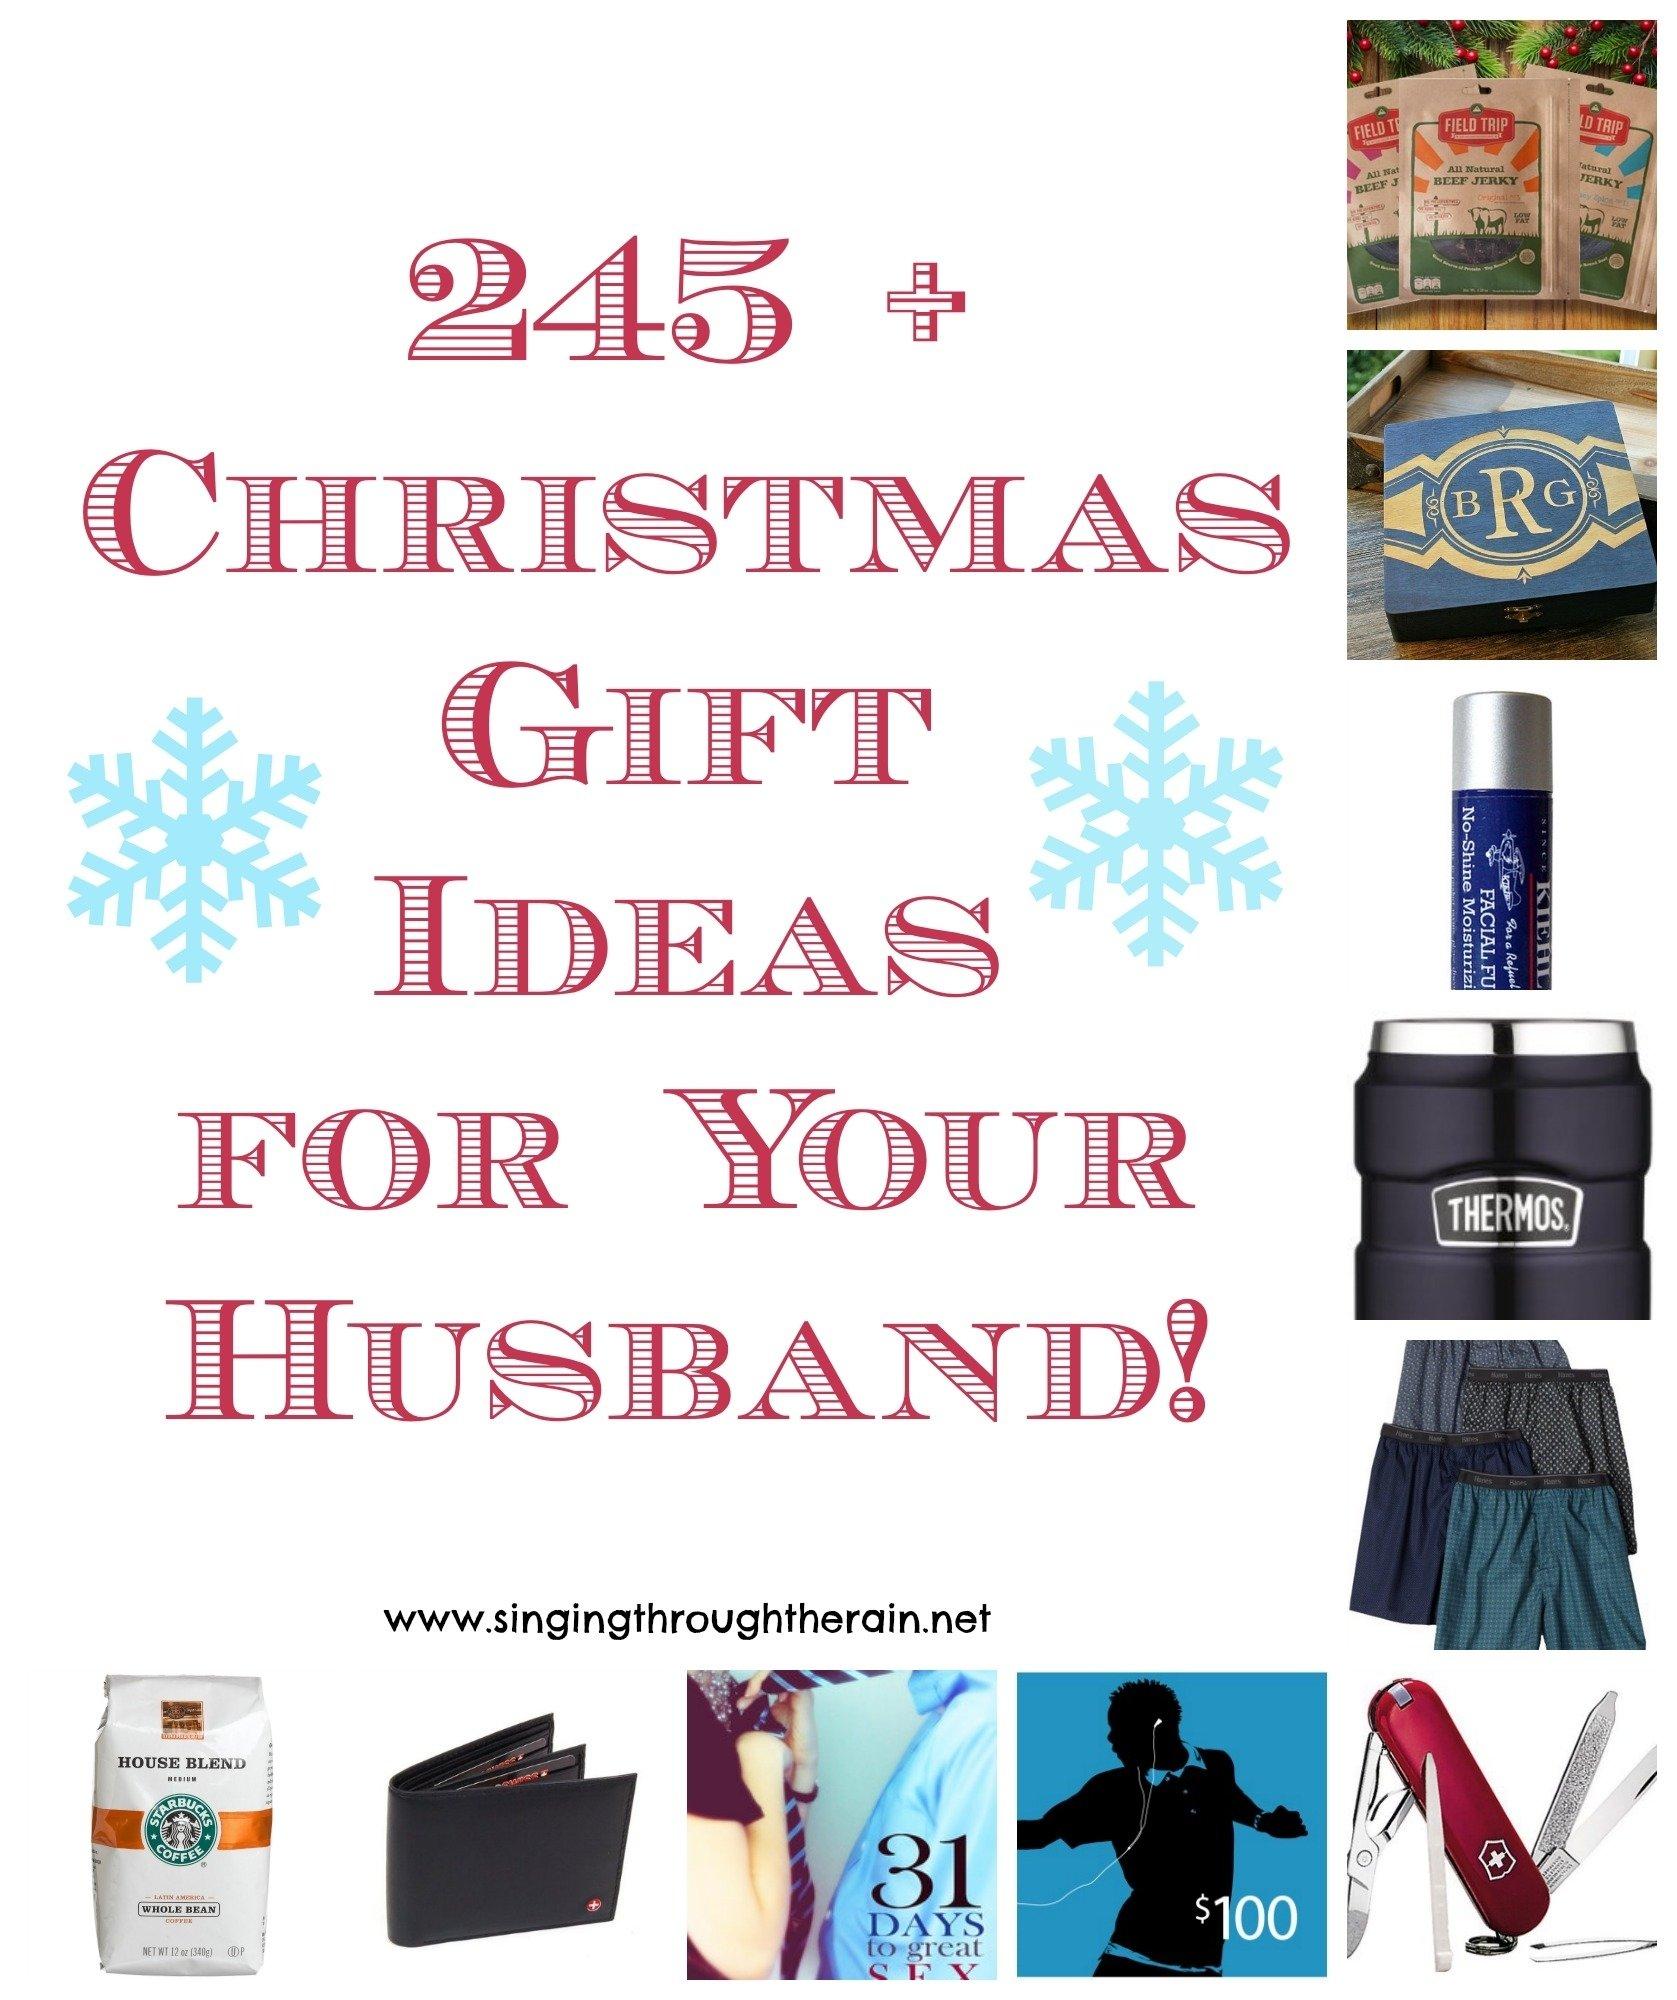 10 Fabulous Christmas Ideas For My Wife cute xmas gift for husband 8 anadolukardiyolderg 2021